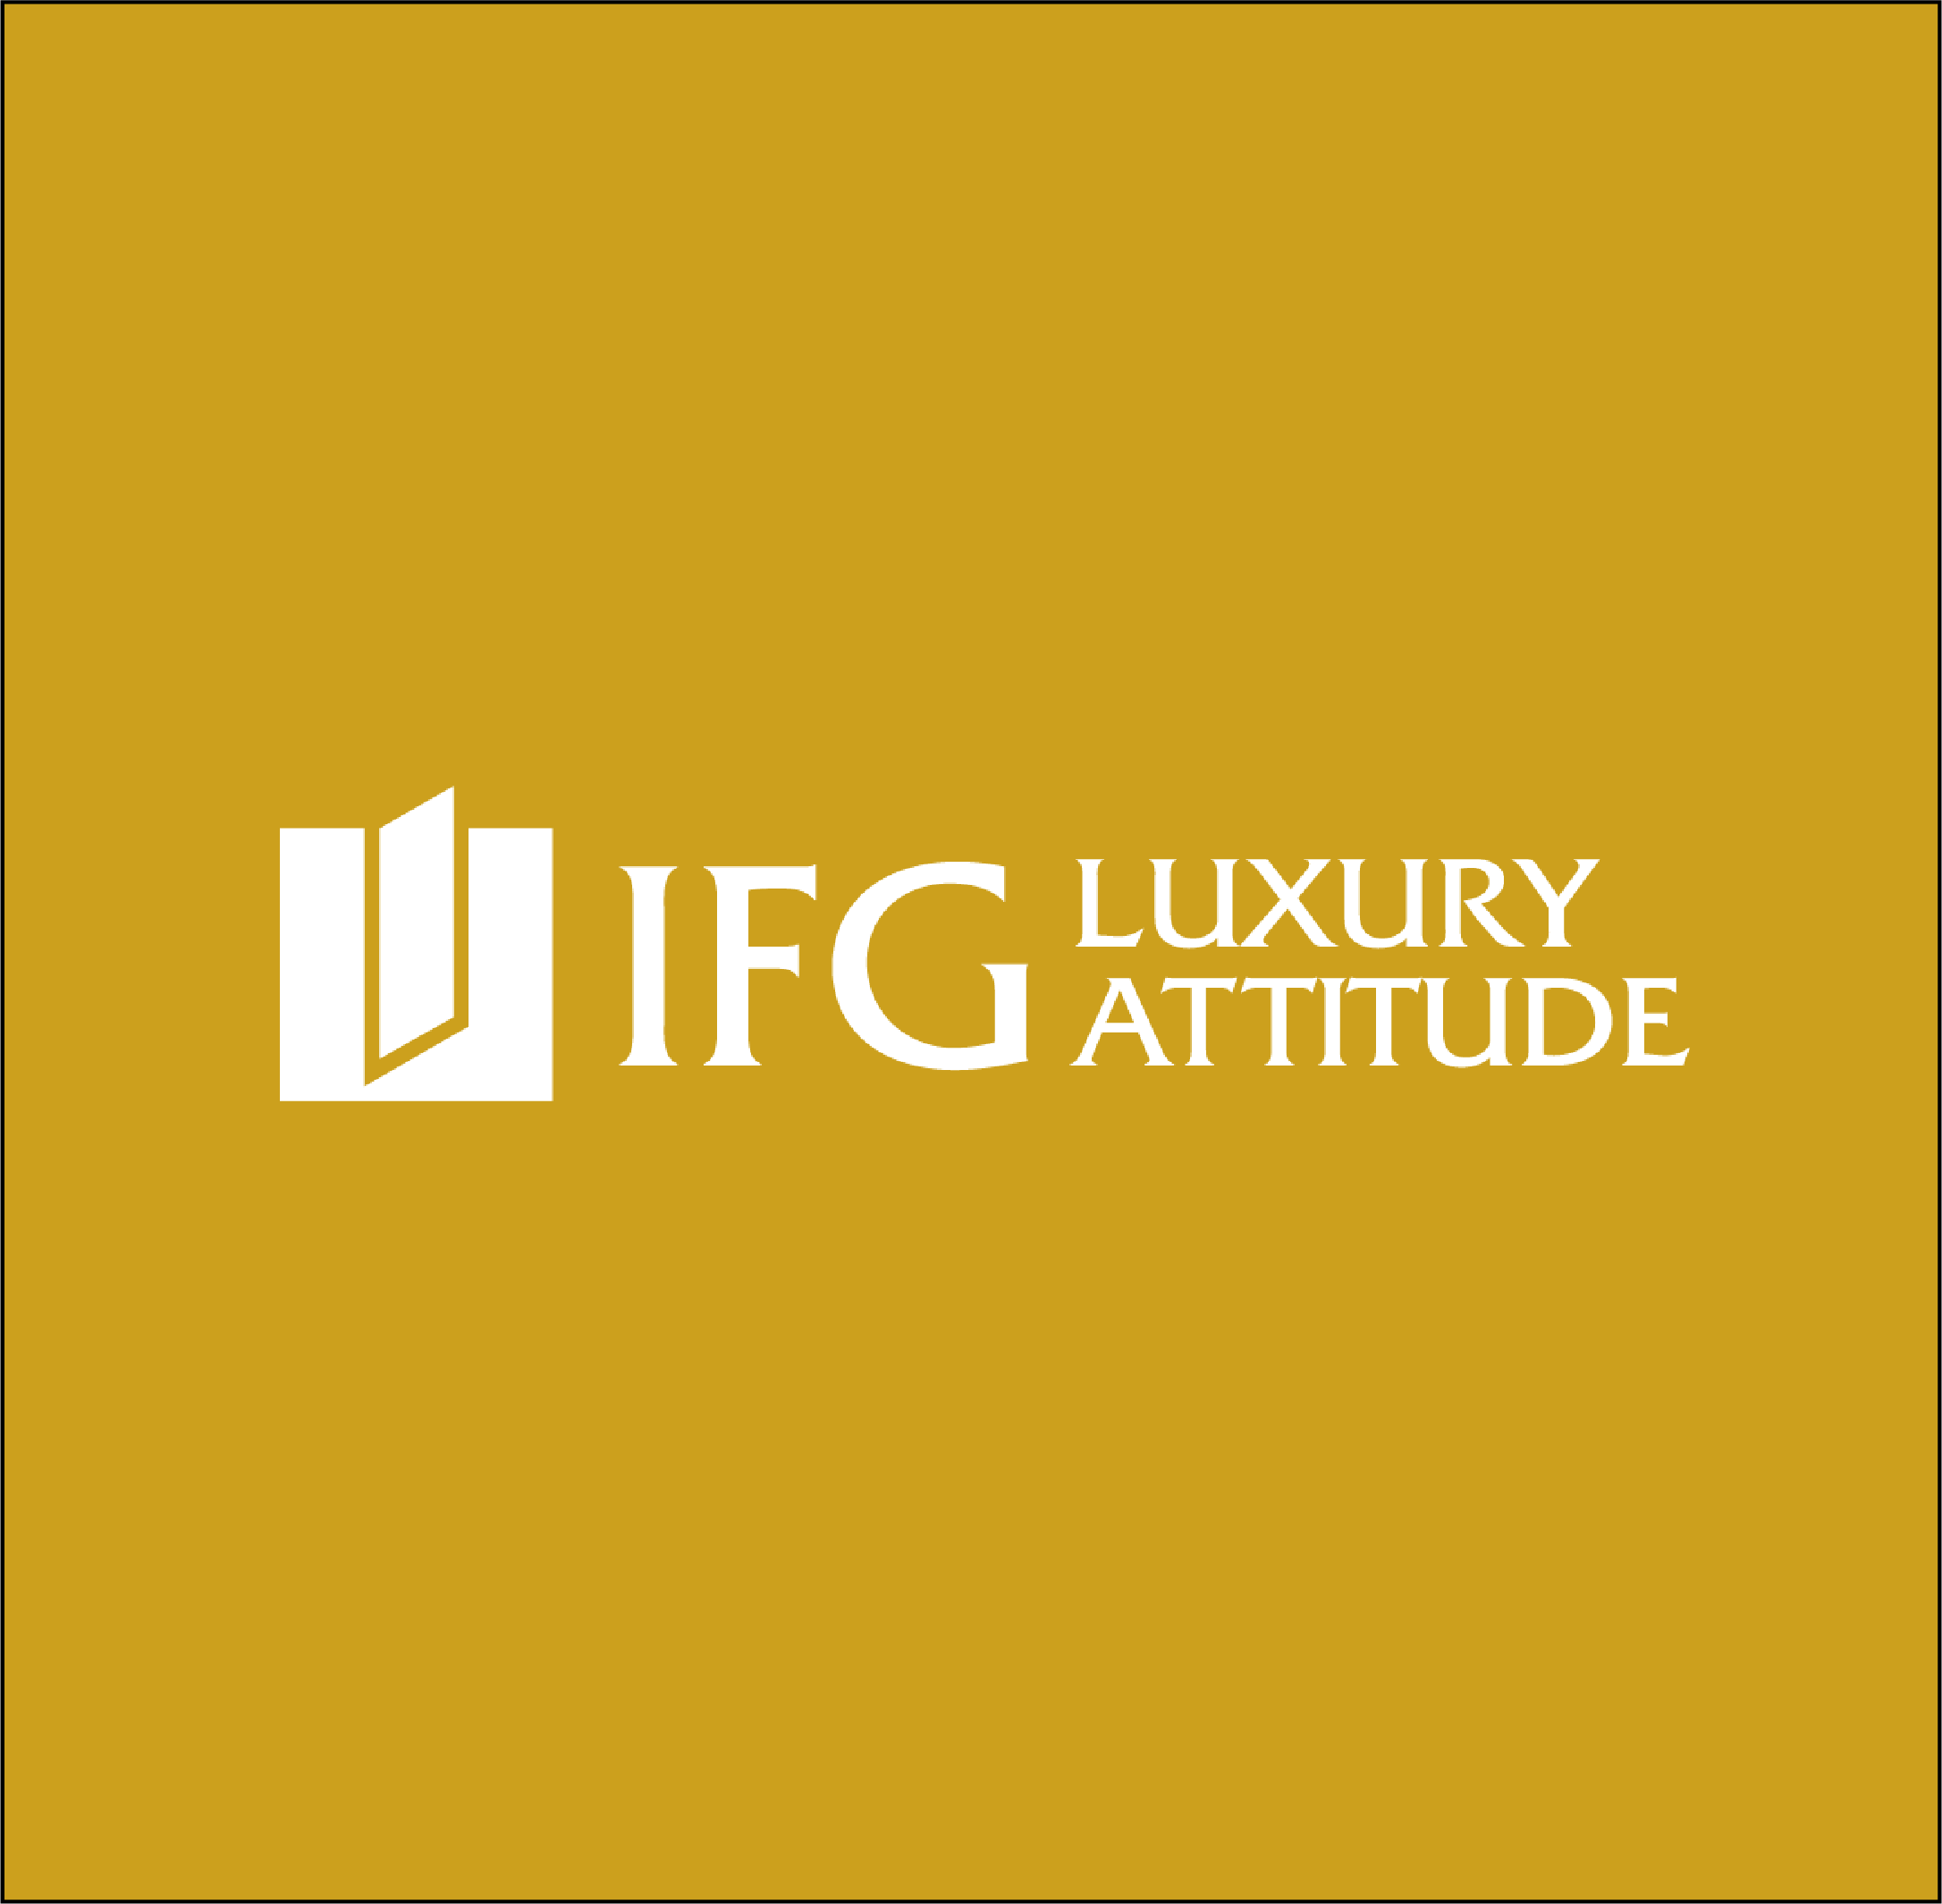 IFG LUXURY ATTITUDE